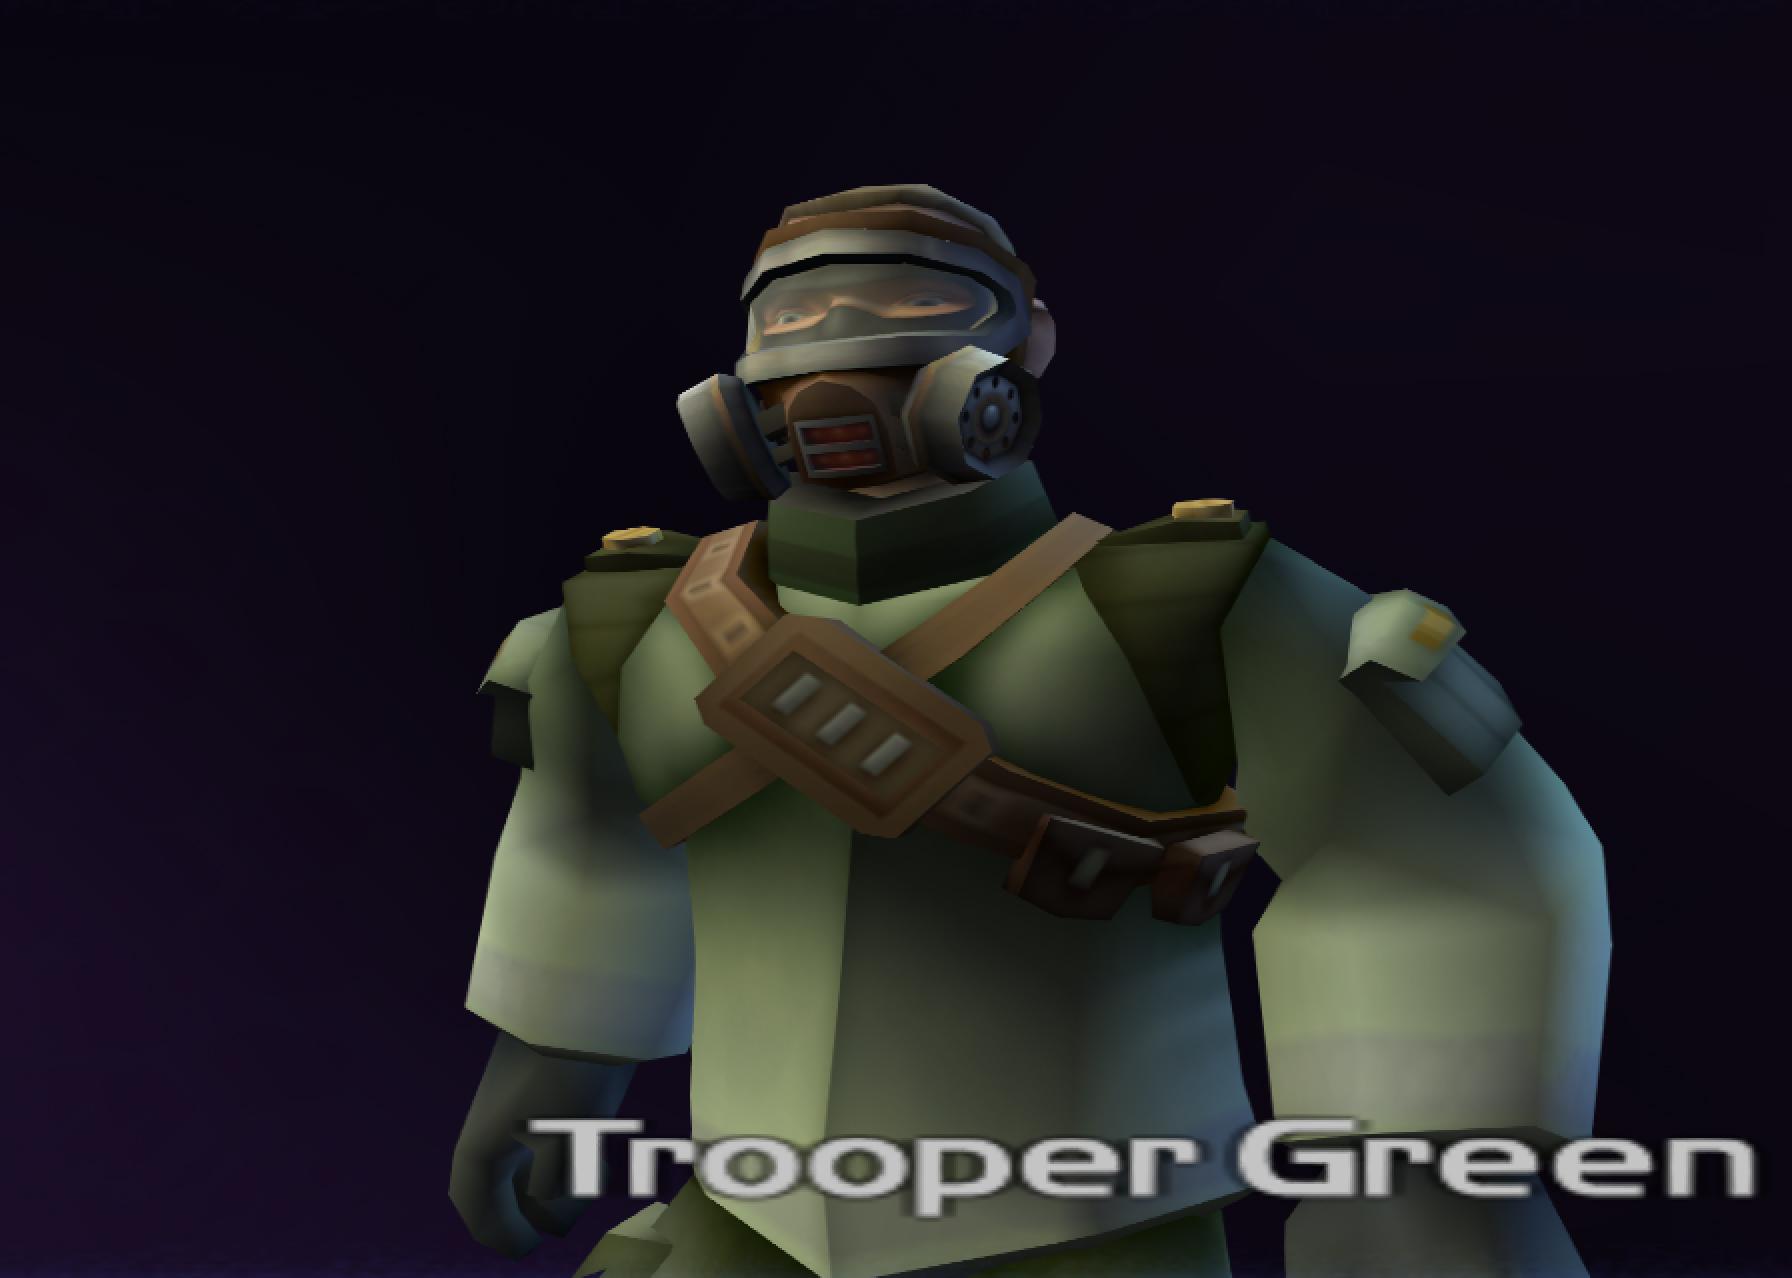 Trooper Green